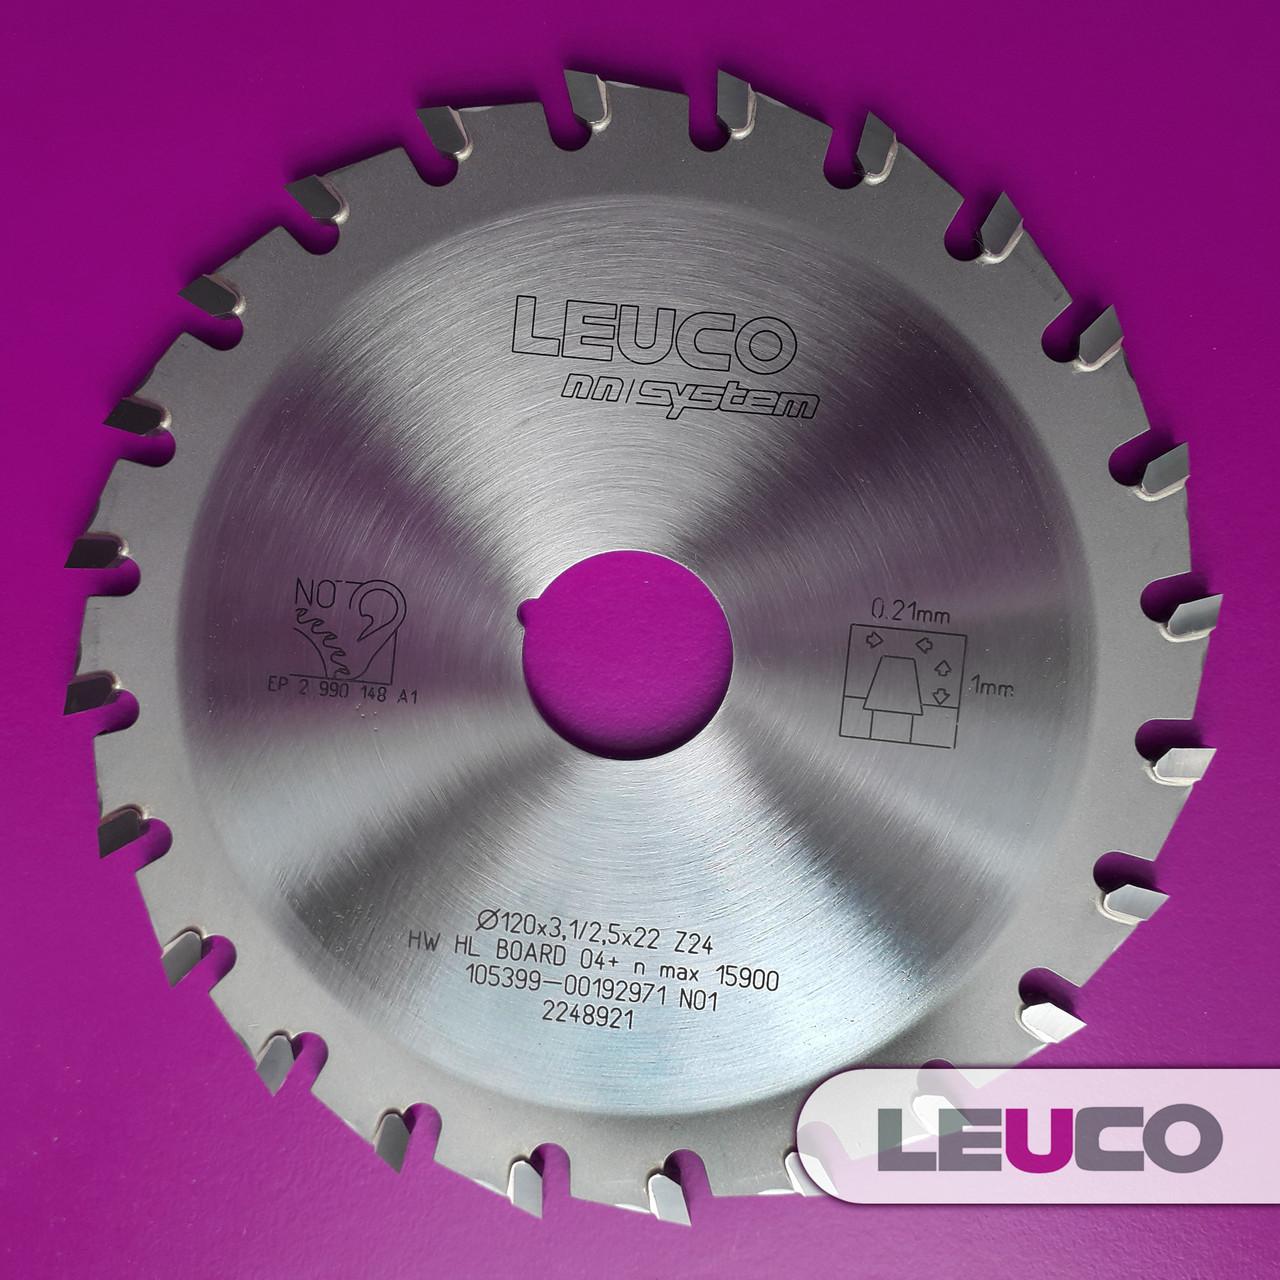 Однокорпусная подрезная дисковая пила Leuco - nn-System для форматно-раскроечных станков, 120x3,1-3,9x20, Z=24